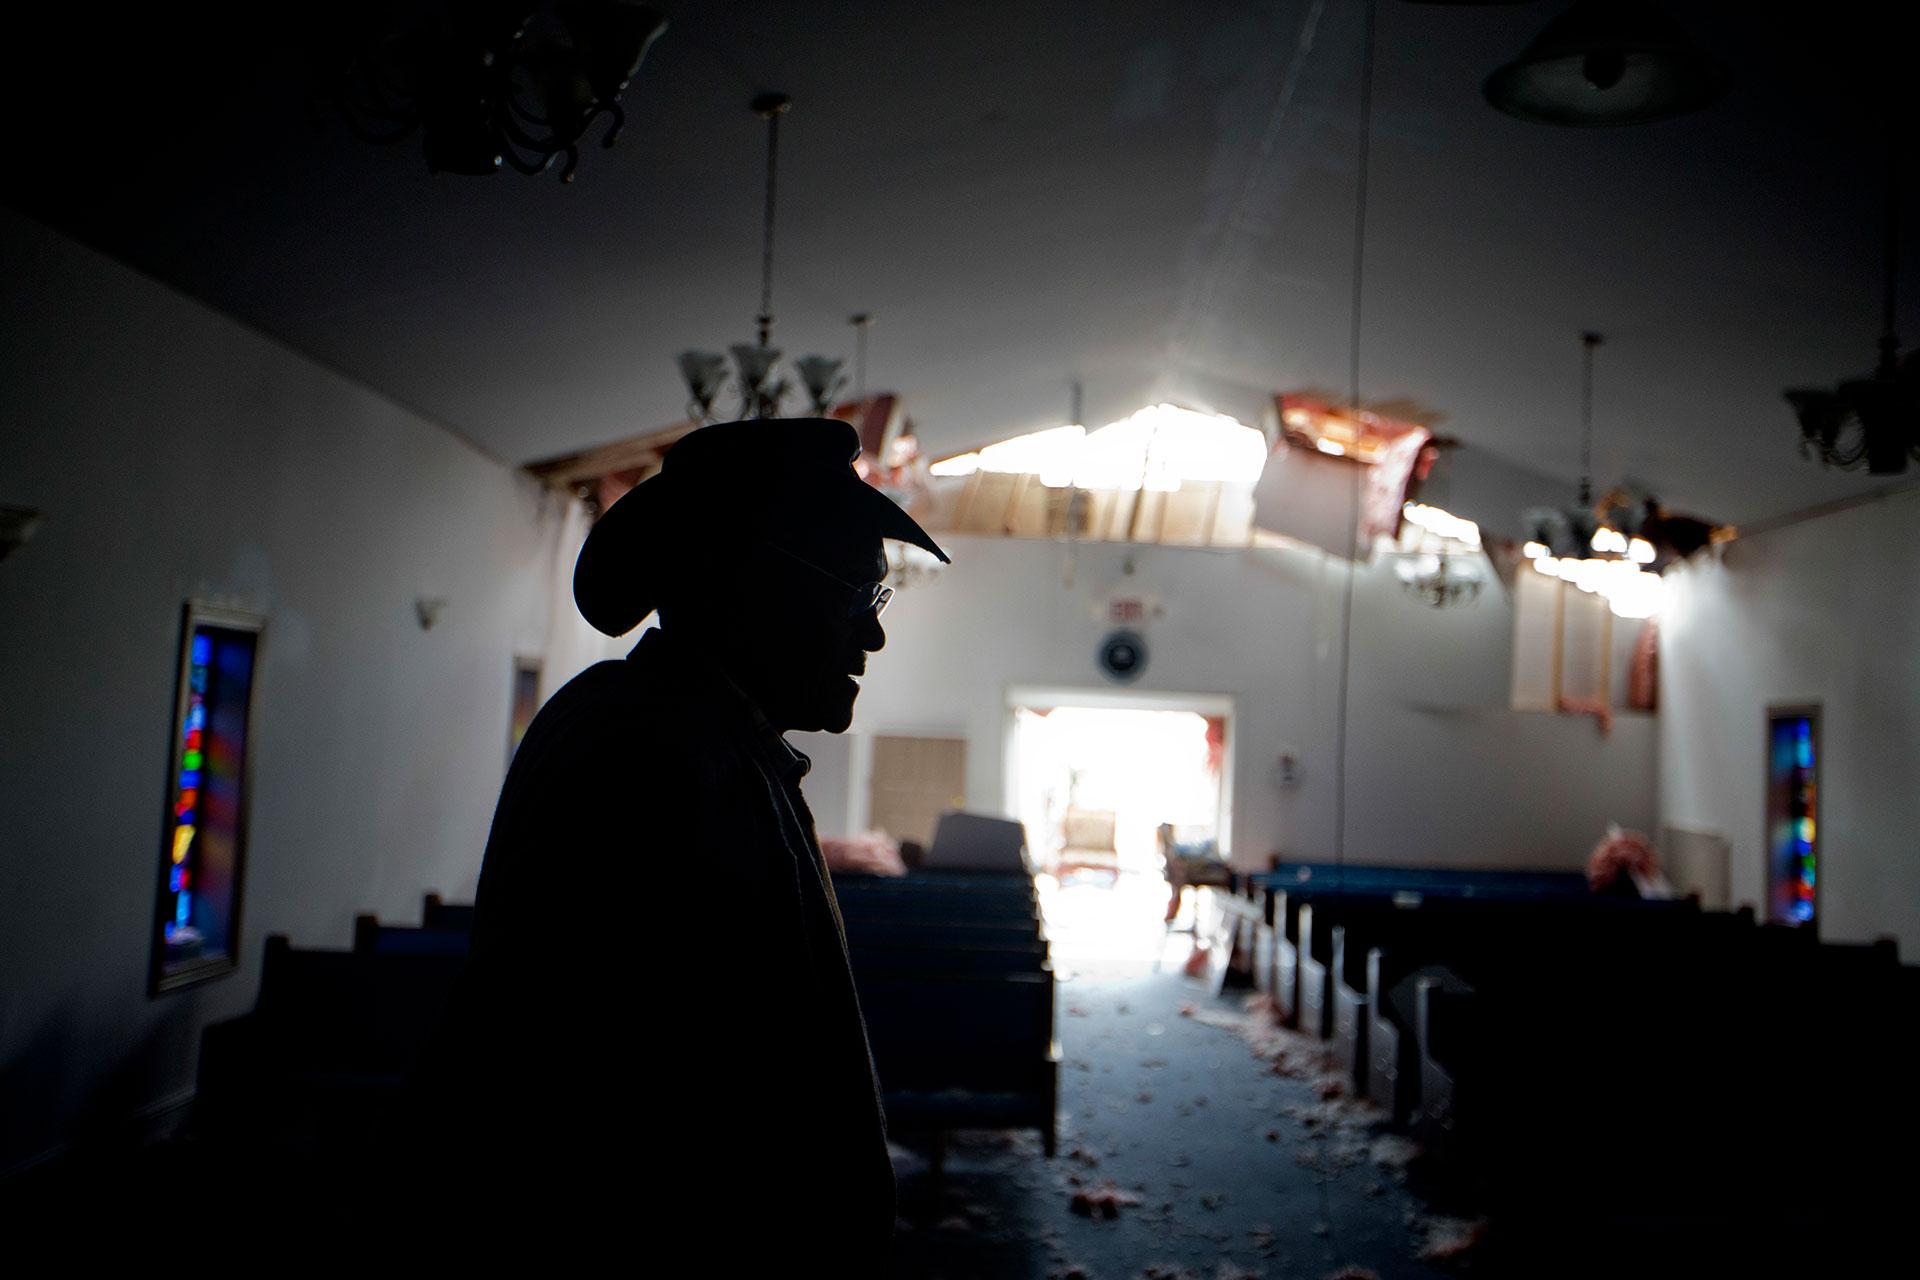 El pastor Lester Woodard, en la mismaiglesia